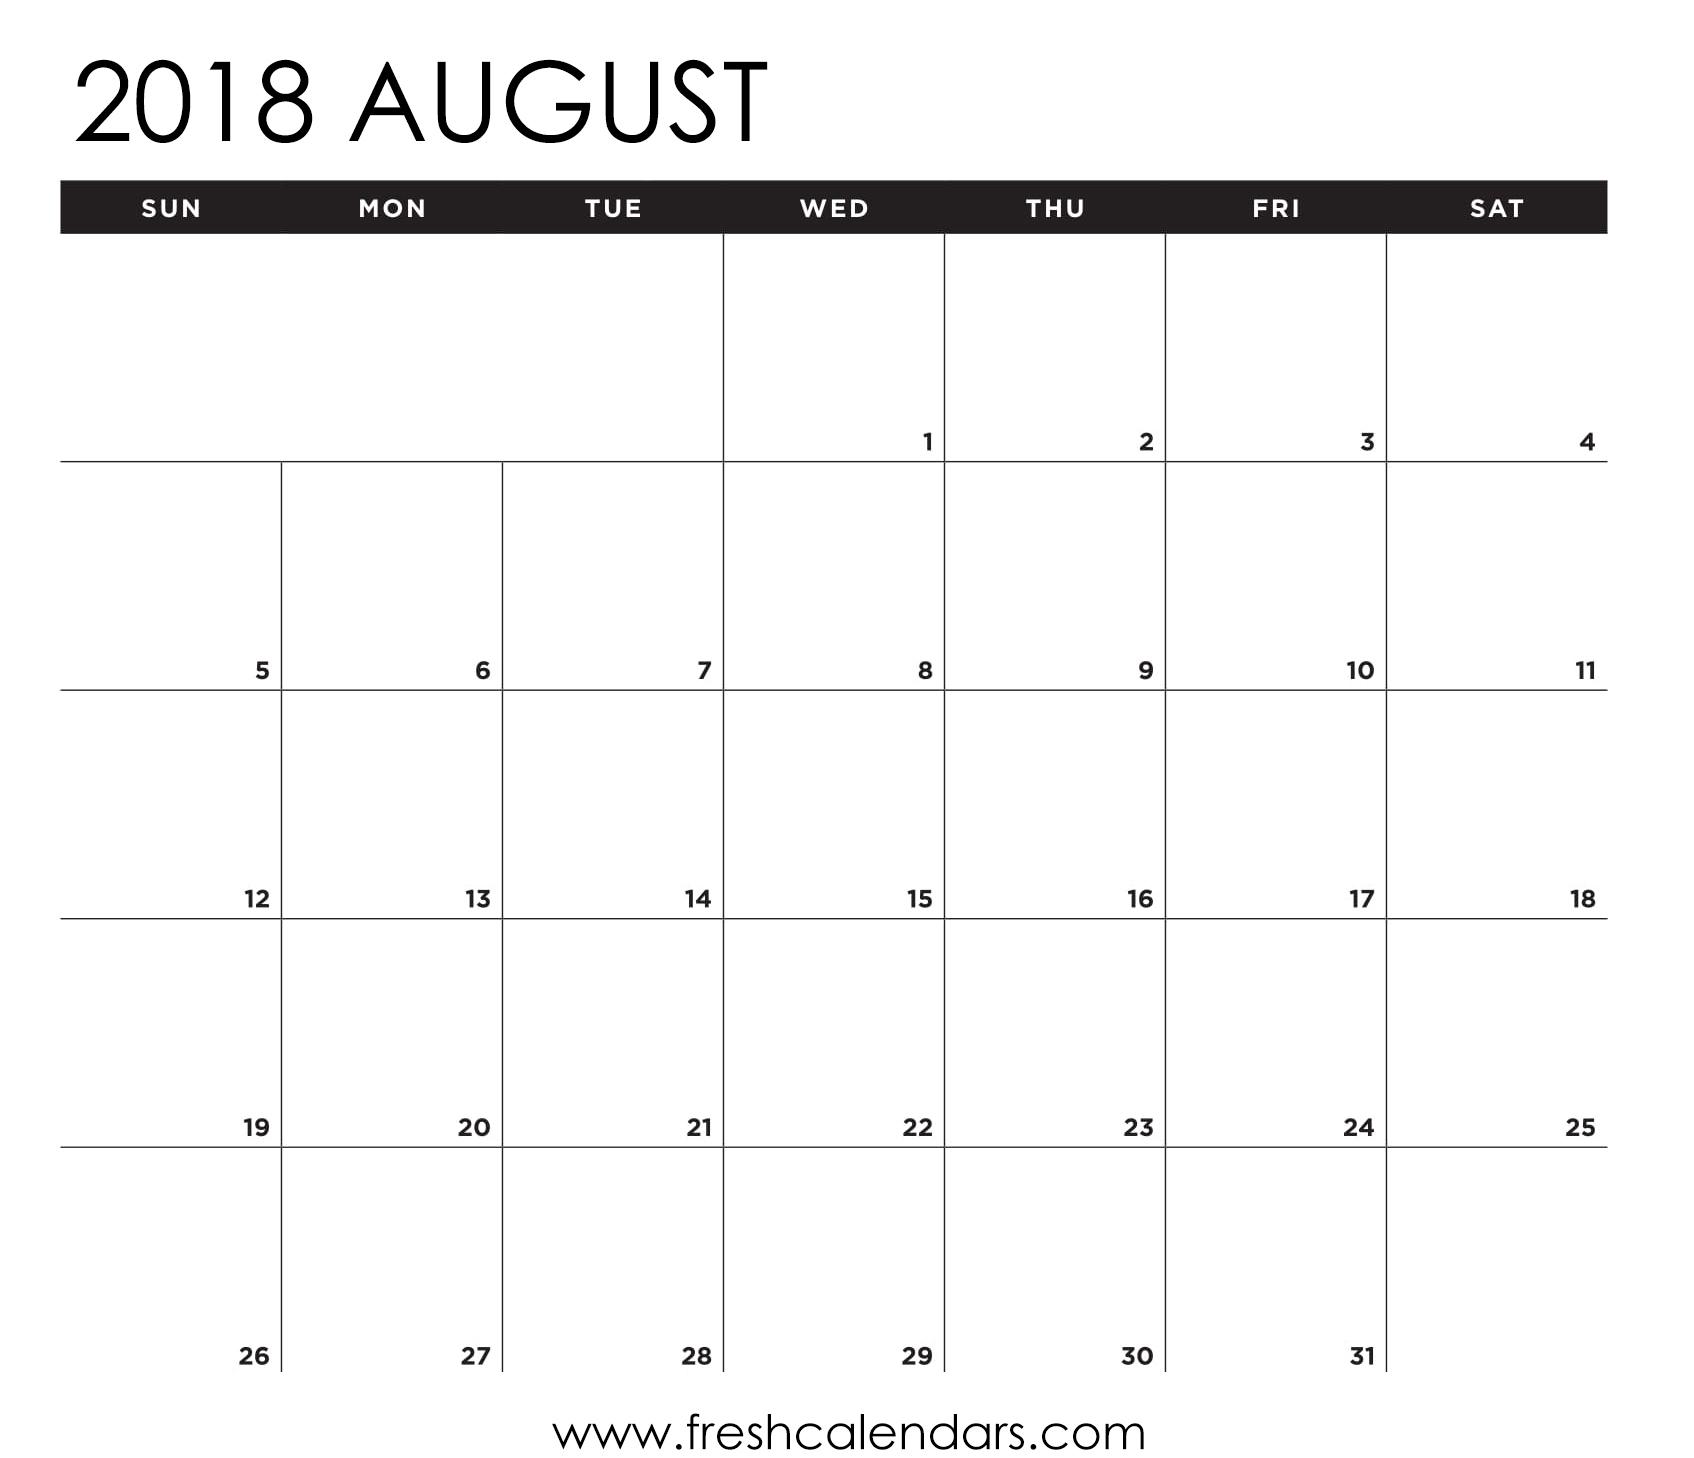 Calendar Spreadsheet Template 2018 In August 2018 Calendar Printable Templates